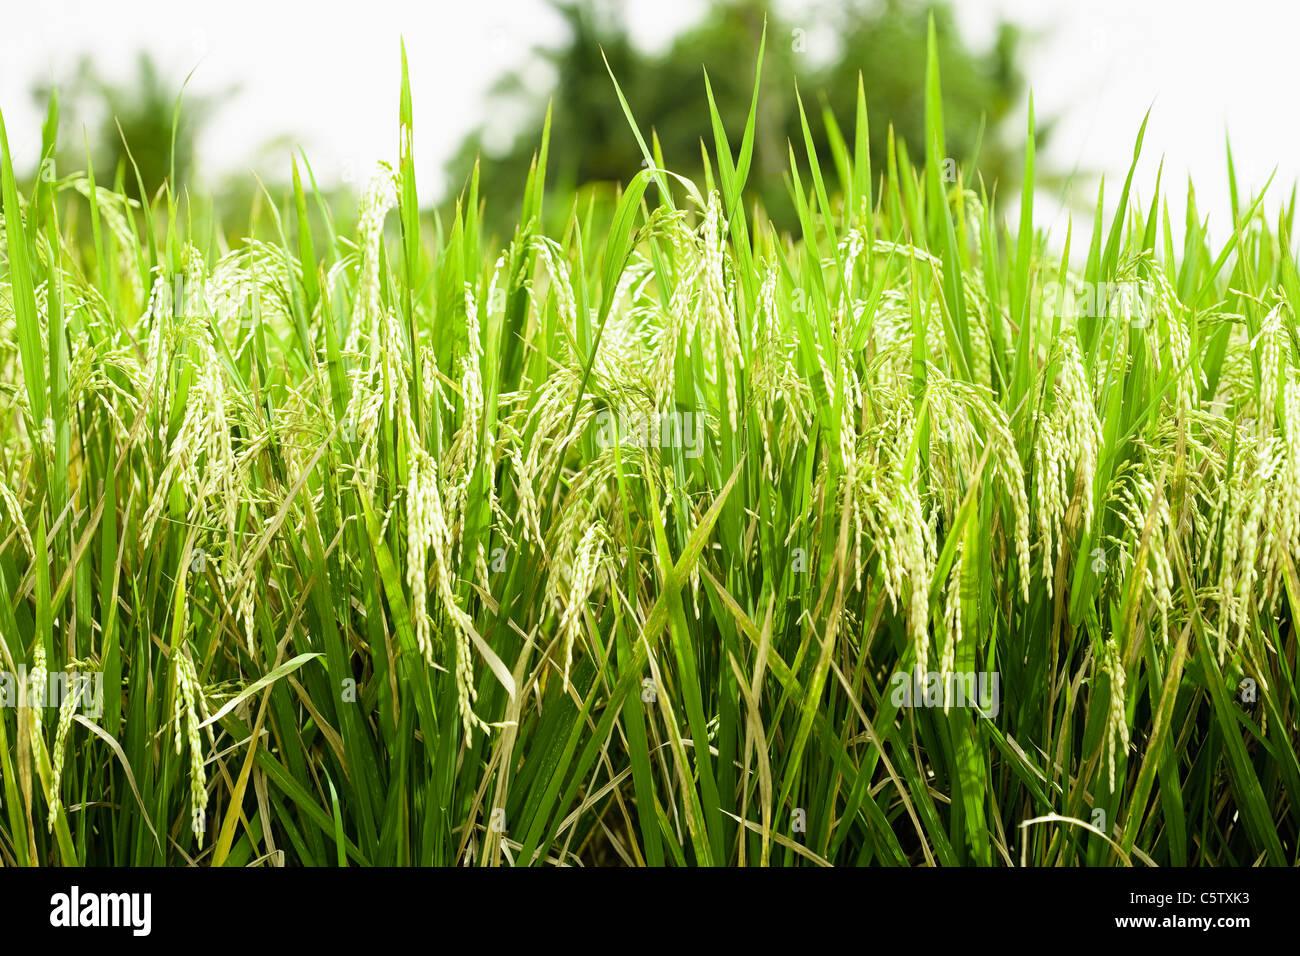 L'Asie, INDONÉSIE, Bali, brins d'herbe, close-up Banque D'Images